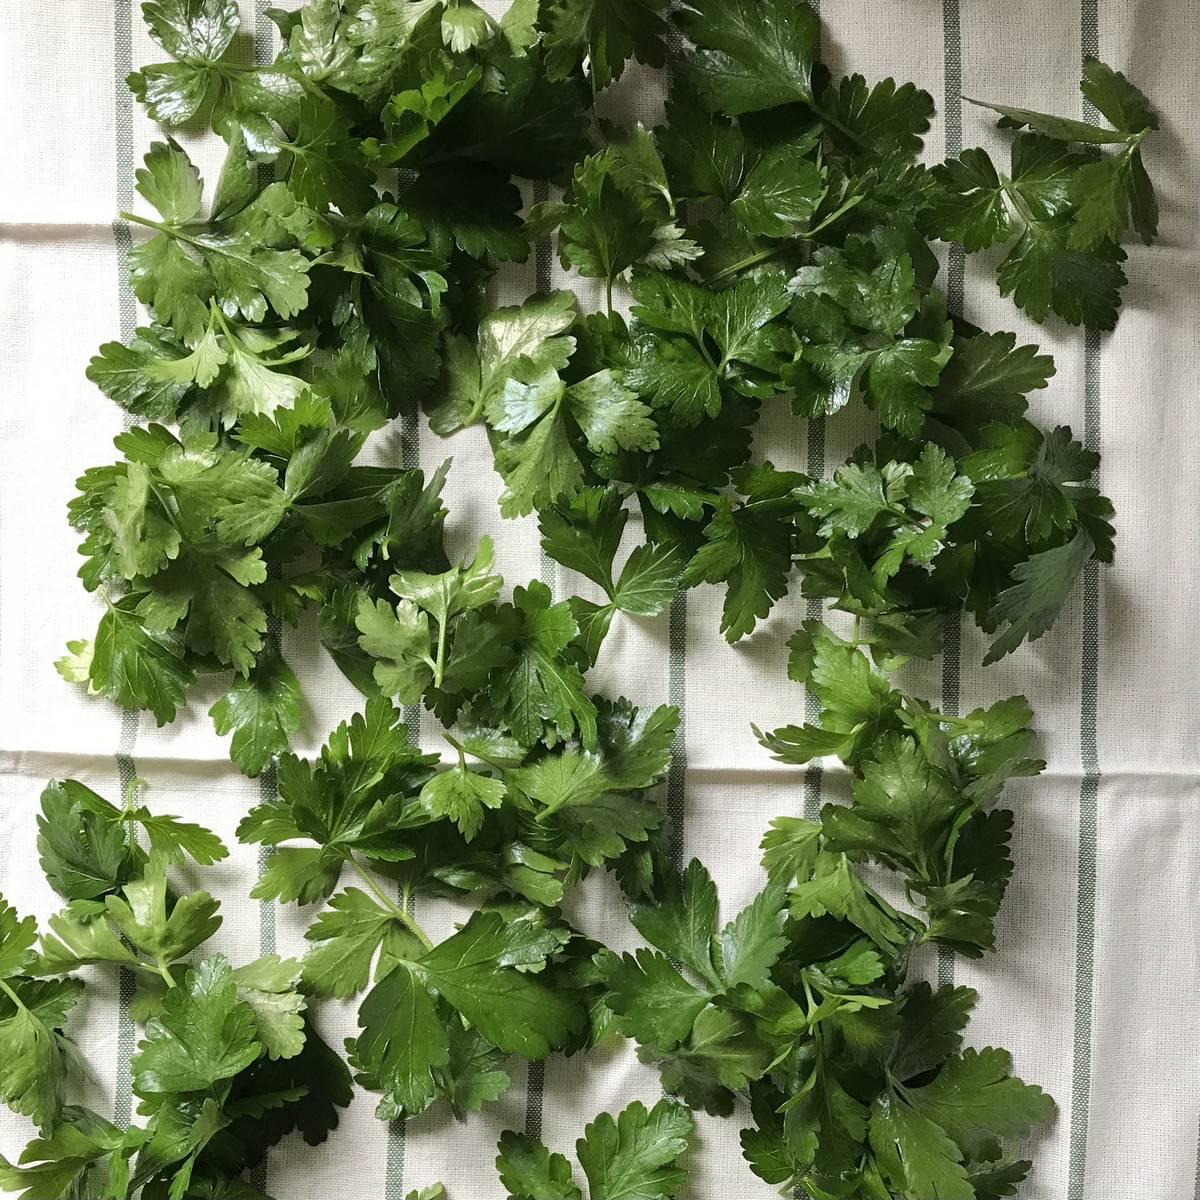 Fresh parsley on a tea towel.